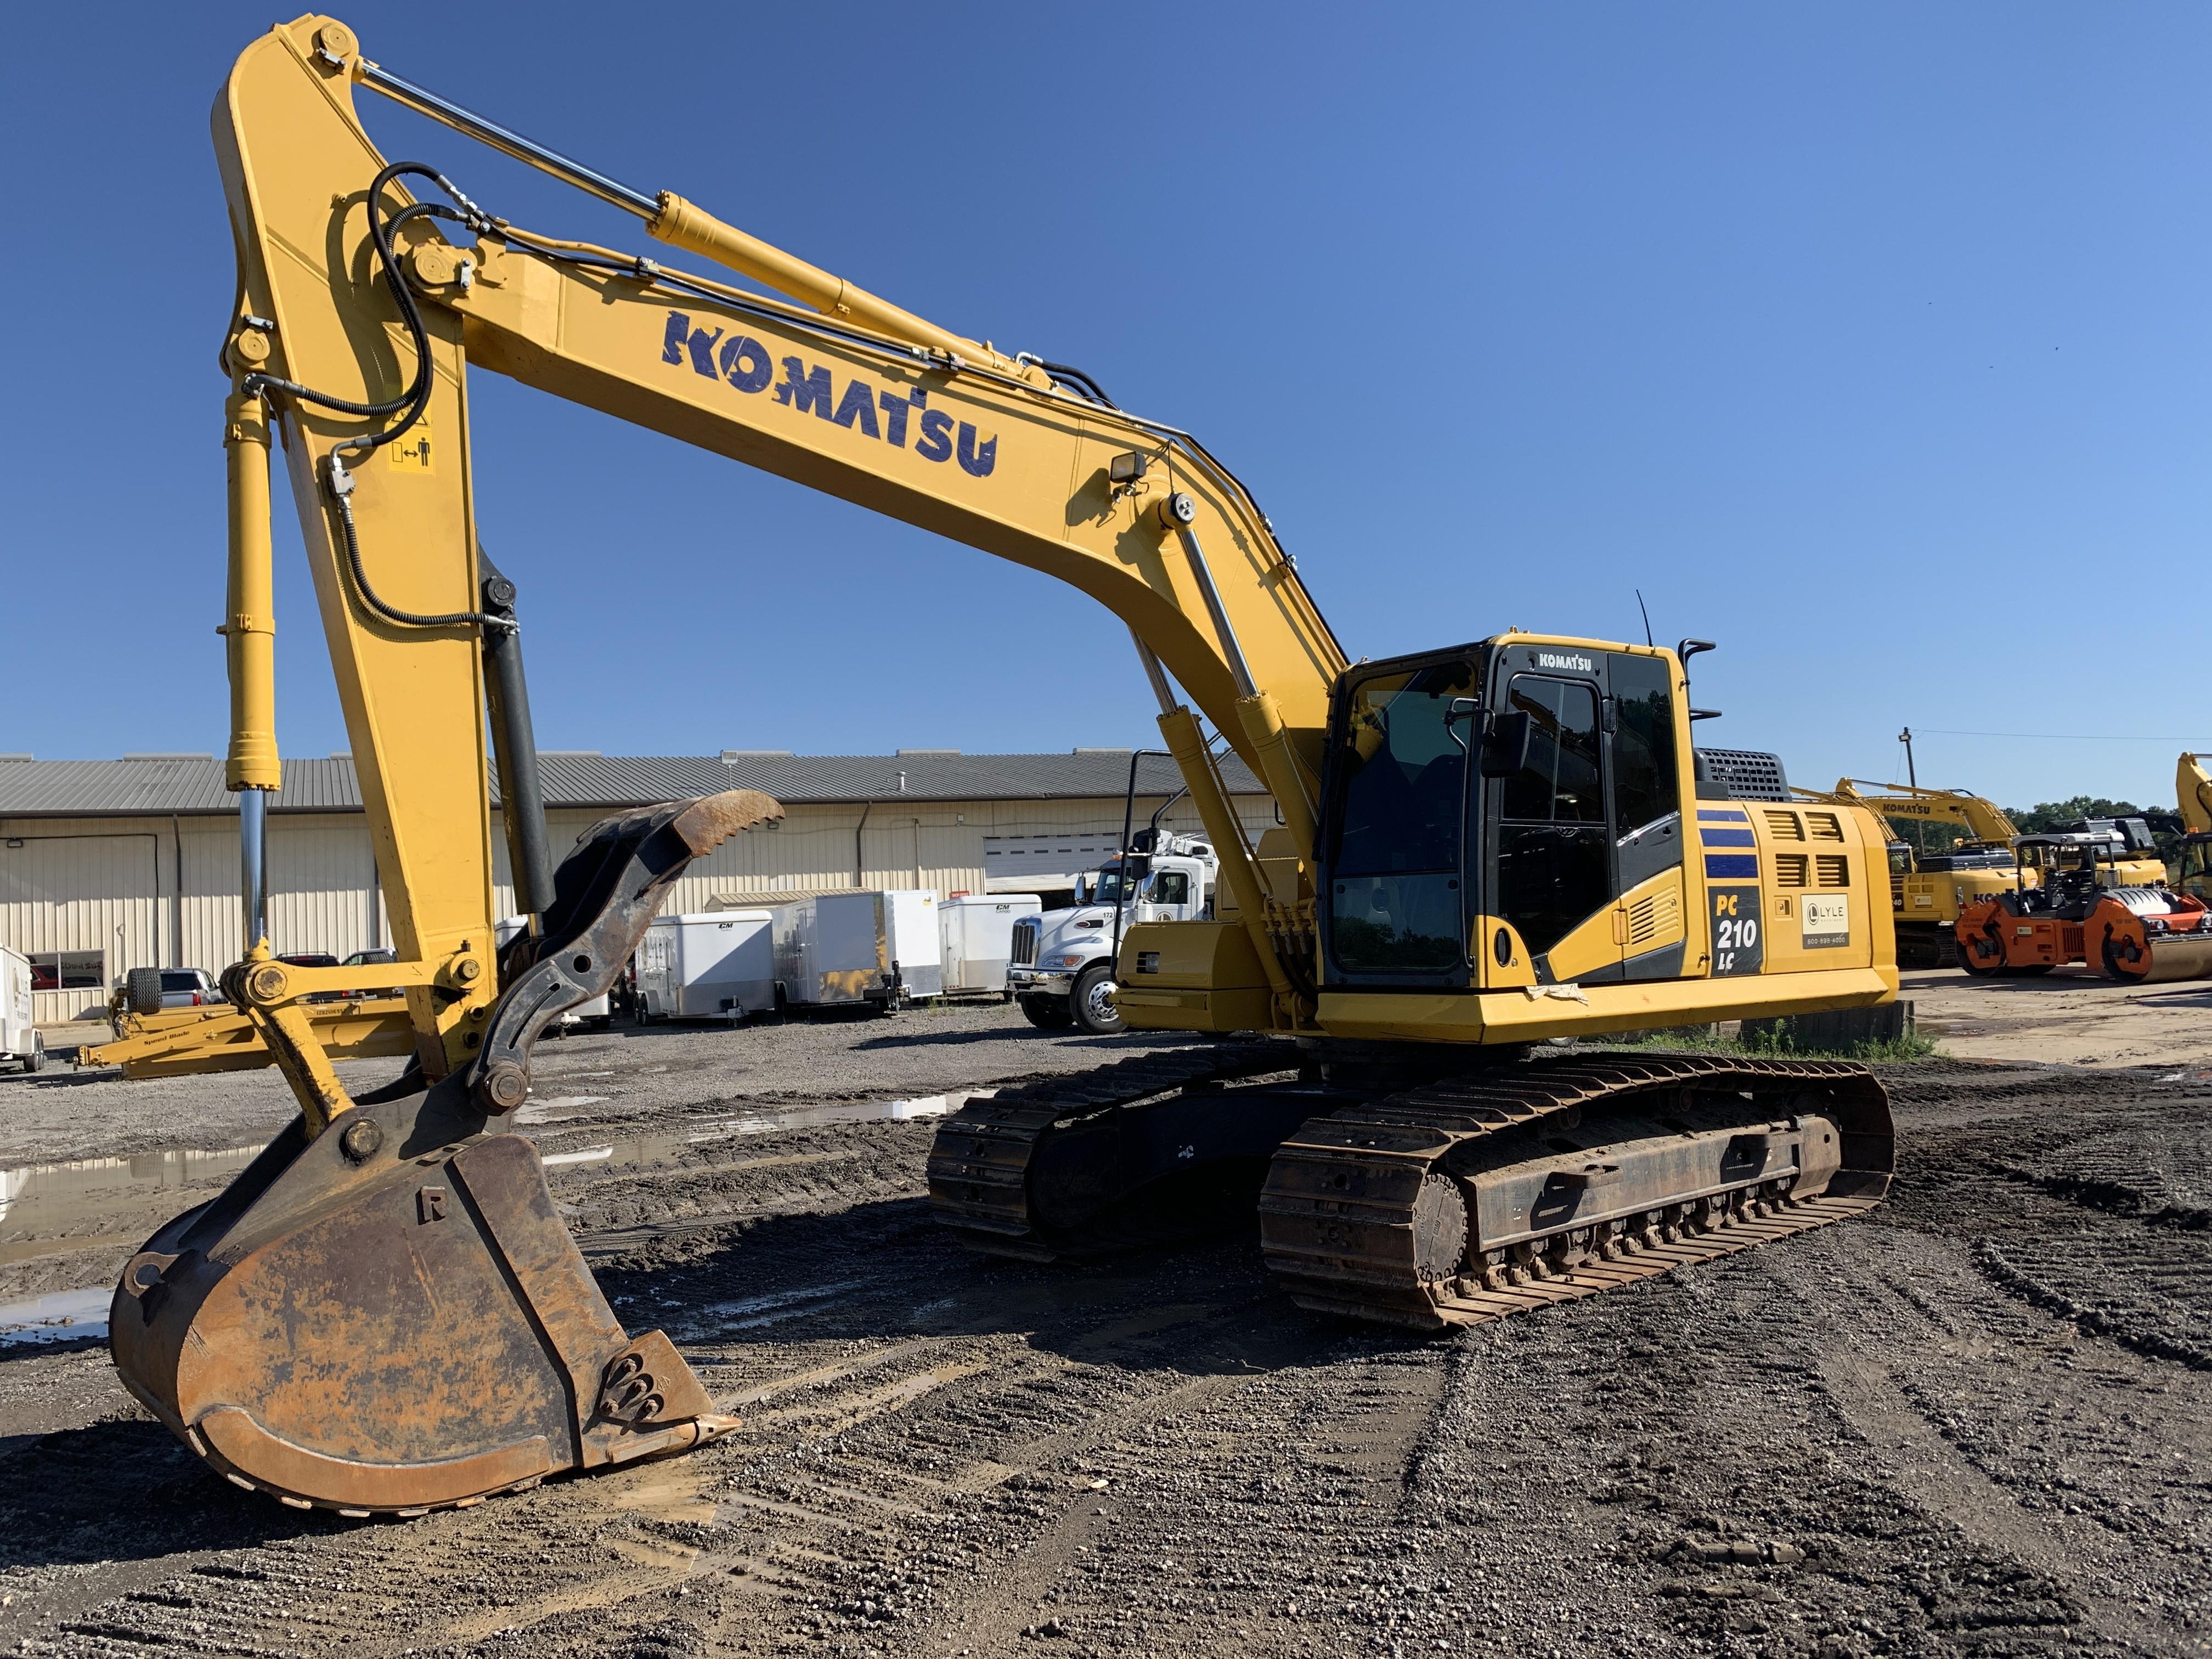 Used, 2017, Komatsu, PC210LC-11, Excavators